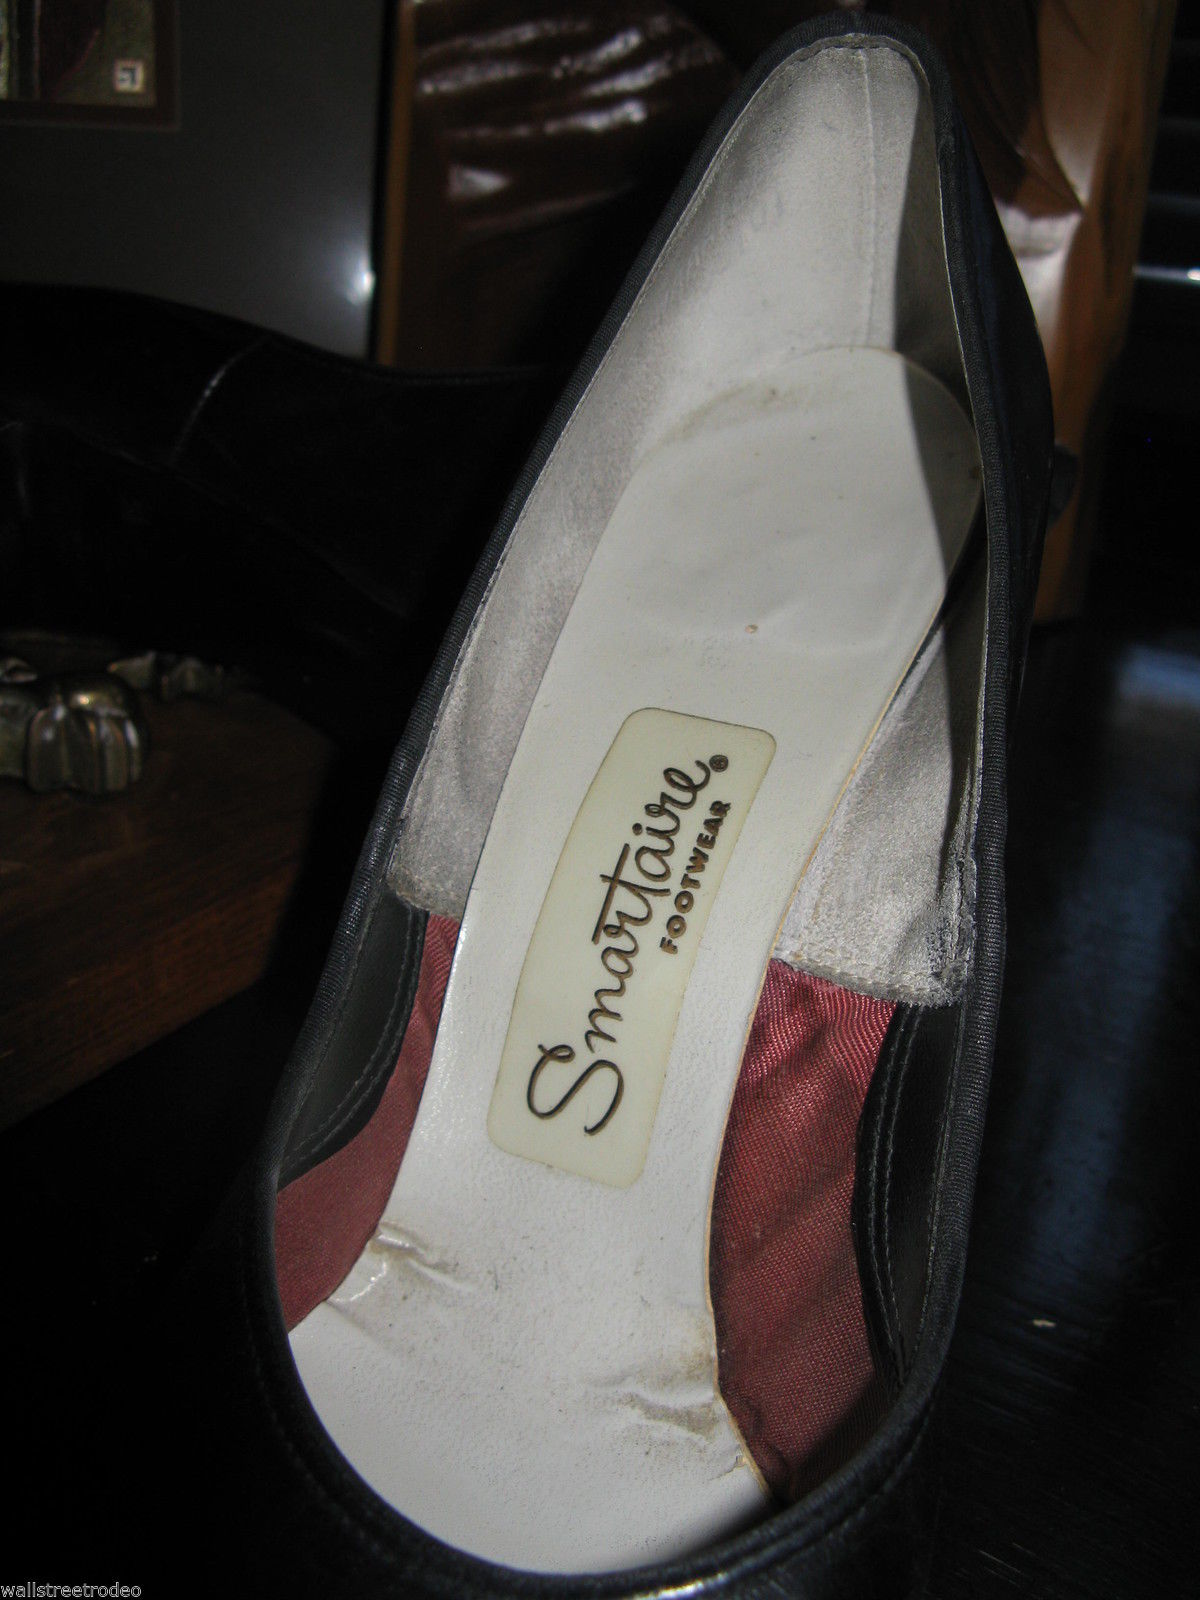 Smartaire vintage Debbie Renolds heels shoes 7 1/2 AAAA VLV 6 UK3.5 36 bonus VLV image 5